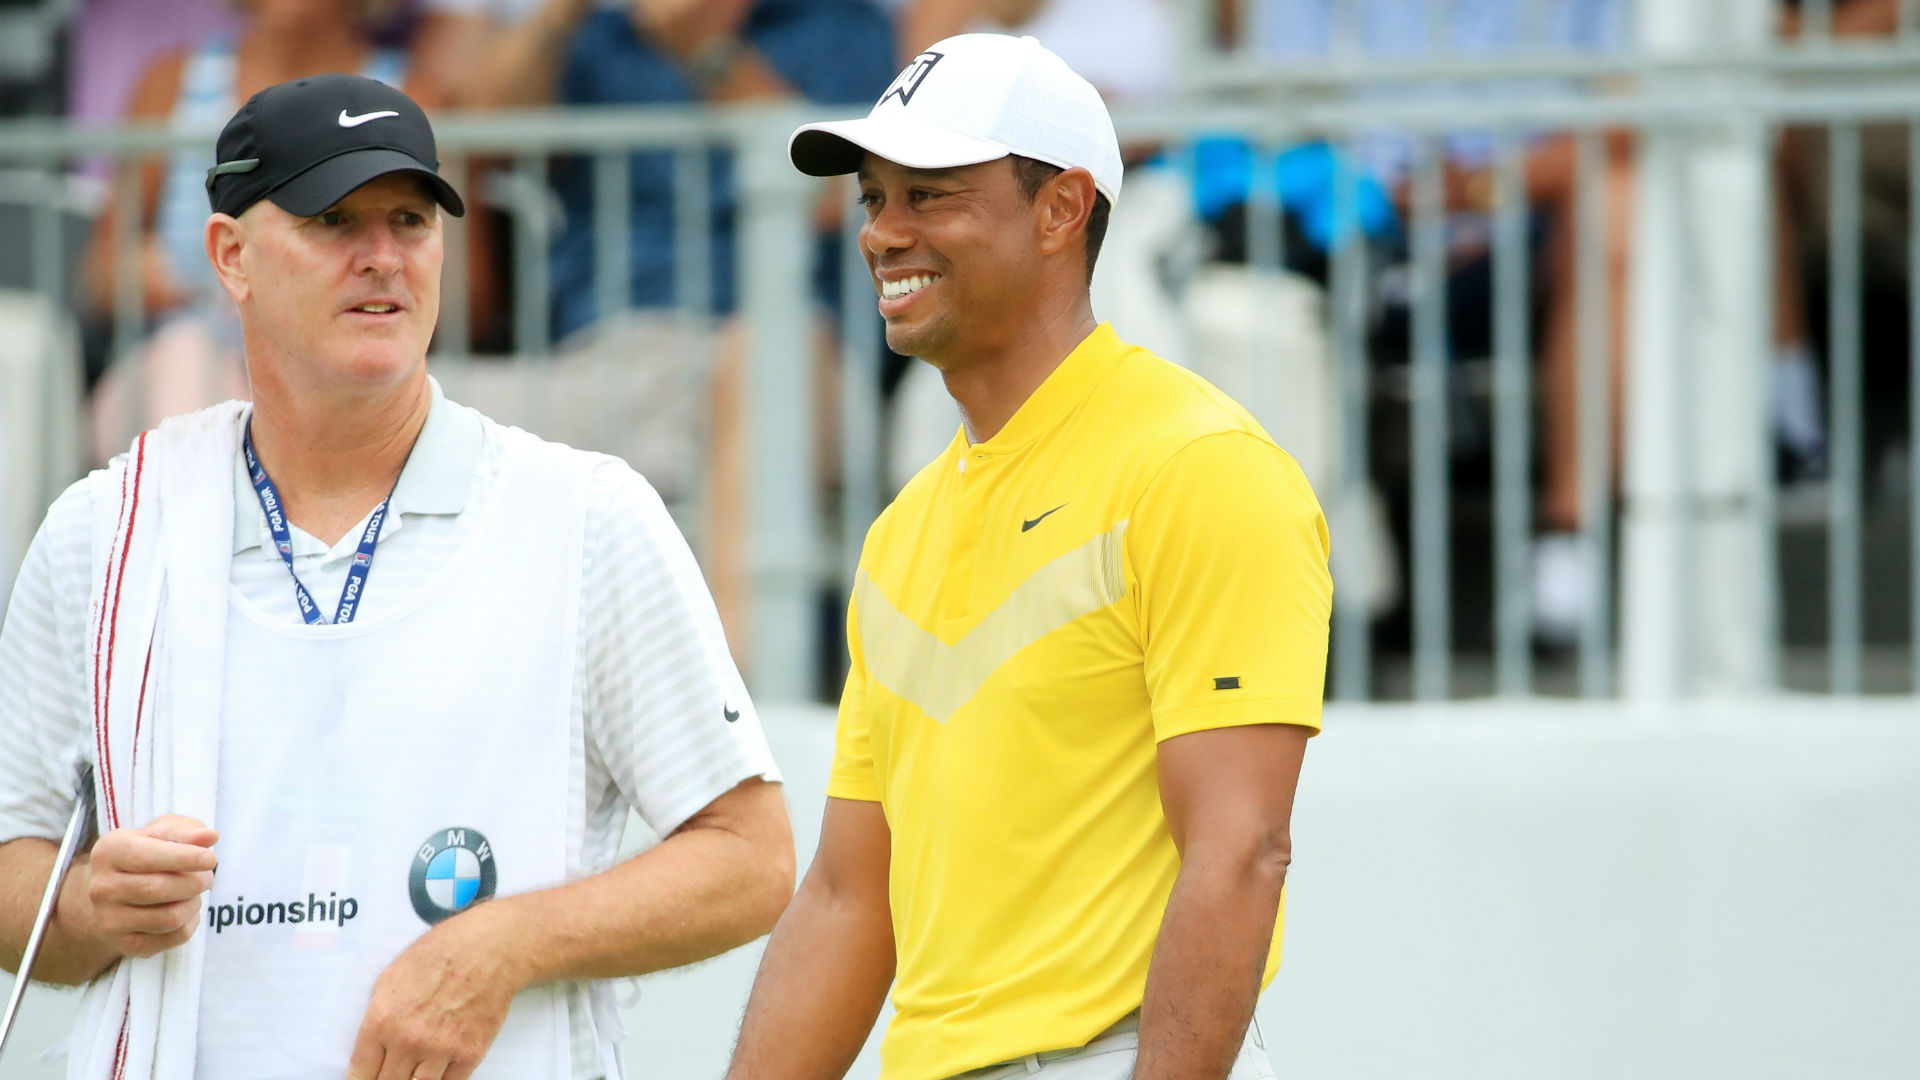 BMW Championship: Tiger Woods jumps up leaderboard, shoots 5-under 67